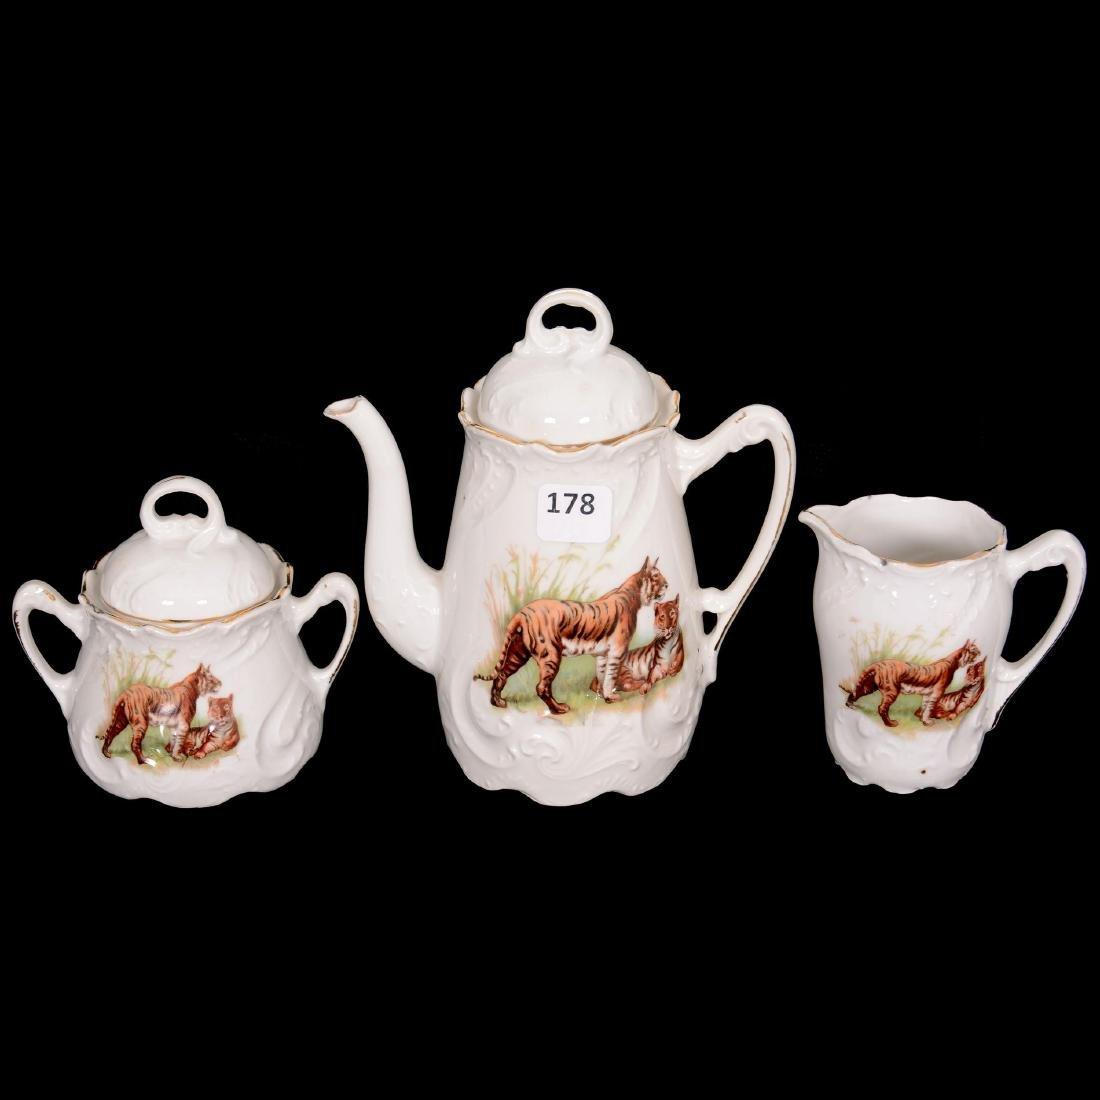 Rare Unmarked Germany Child's Tea Set - 2